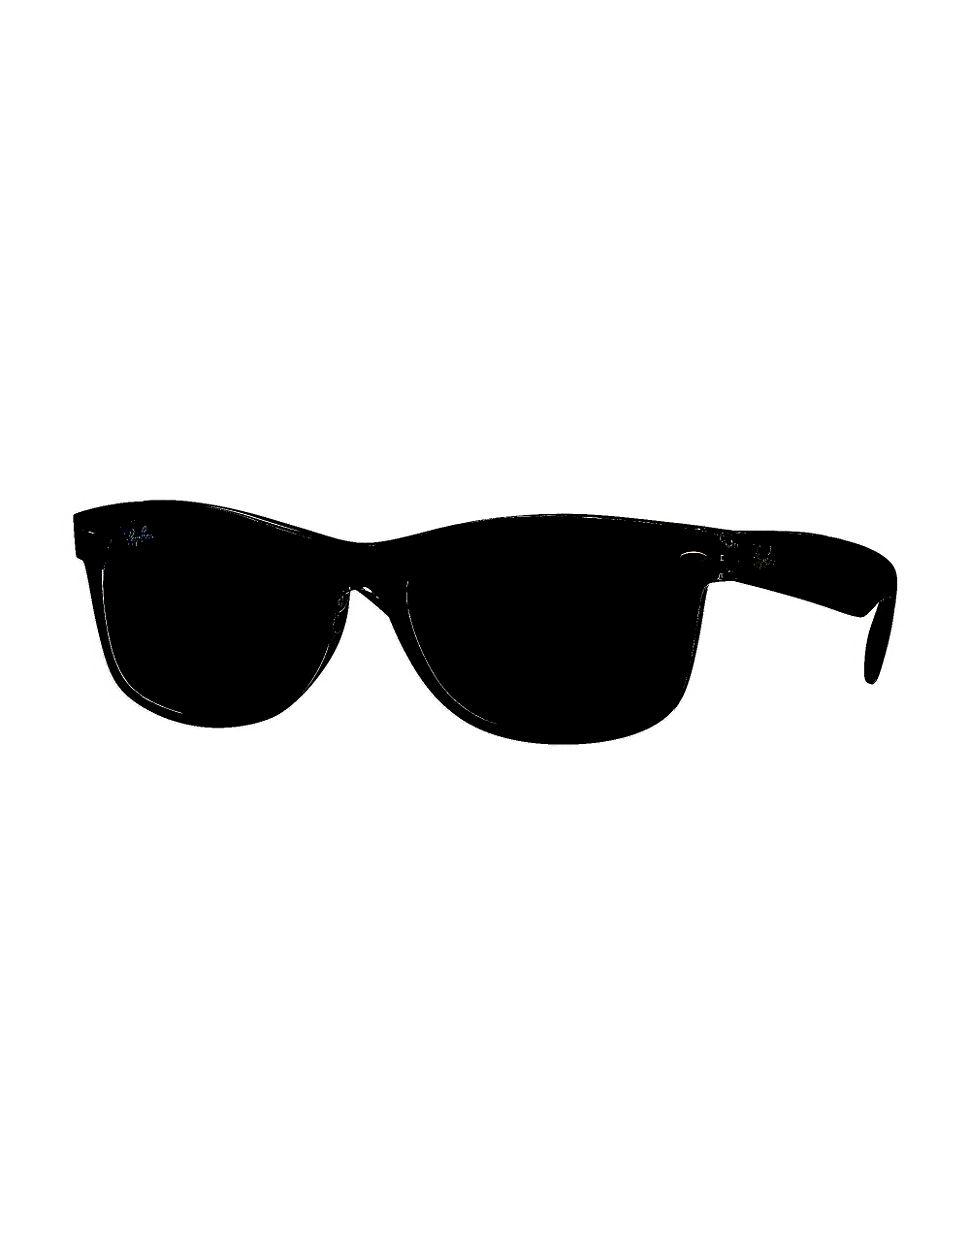 lyst ray ban 55mm new wayfarer sunglasses in black for men Ray-Ban Gold Aviators Celeb gallery